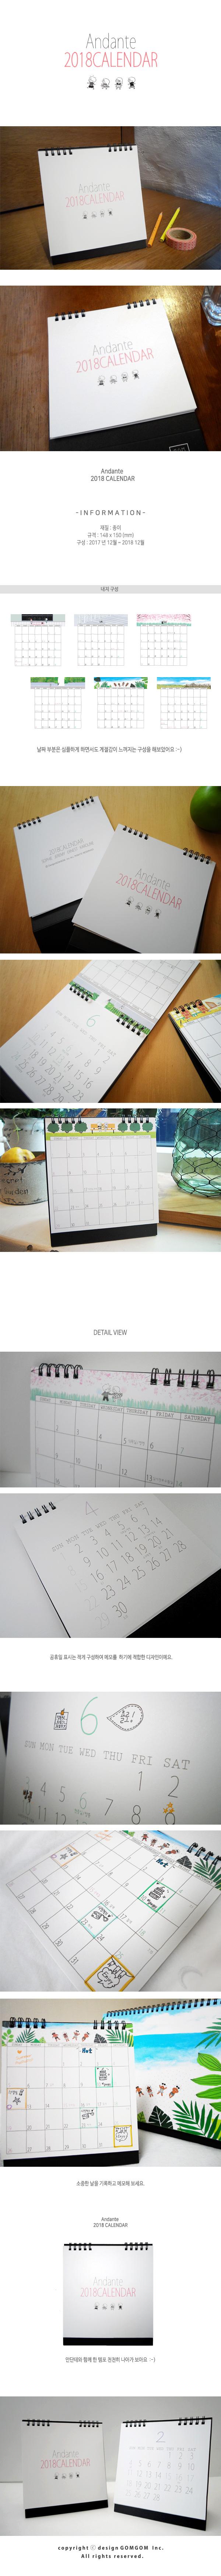 2018 Andante Calendar4,500원-디자인곰곰디자인문구, 다이어리/캘린더, 캘린더, 탁상캘린더날짜형바보사랑2018 Andante Calendar4,500원-디자인곰곰디자인문구, 다이어리/캘린더, 캘린더, 탁상캘린더날짜형바보사랑